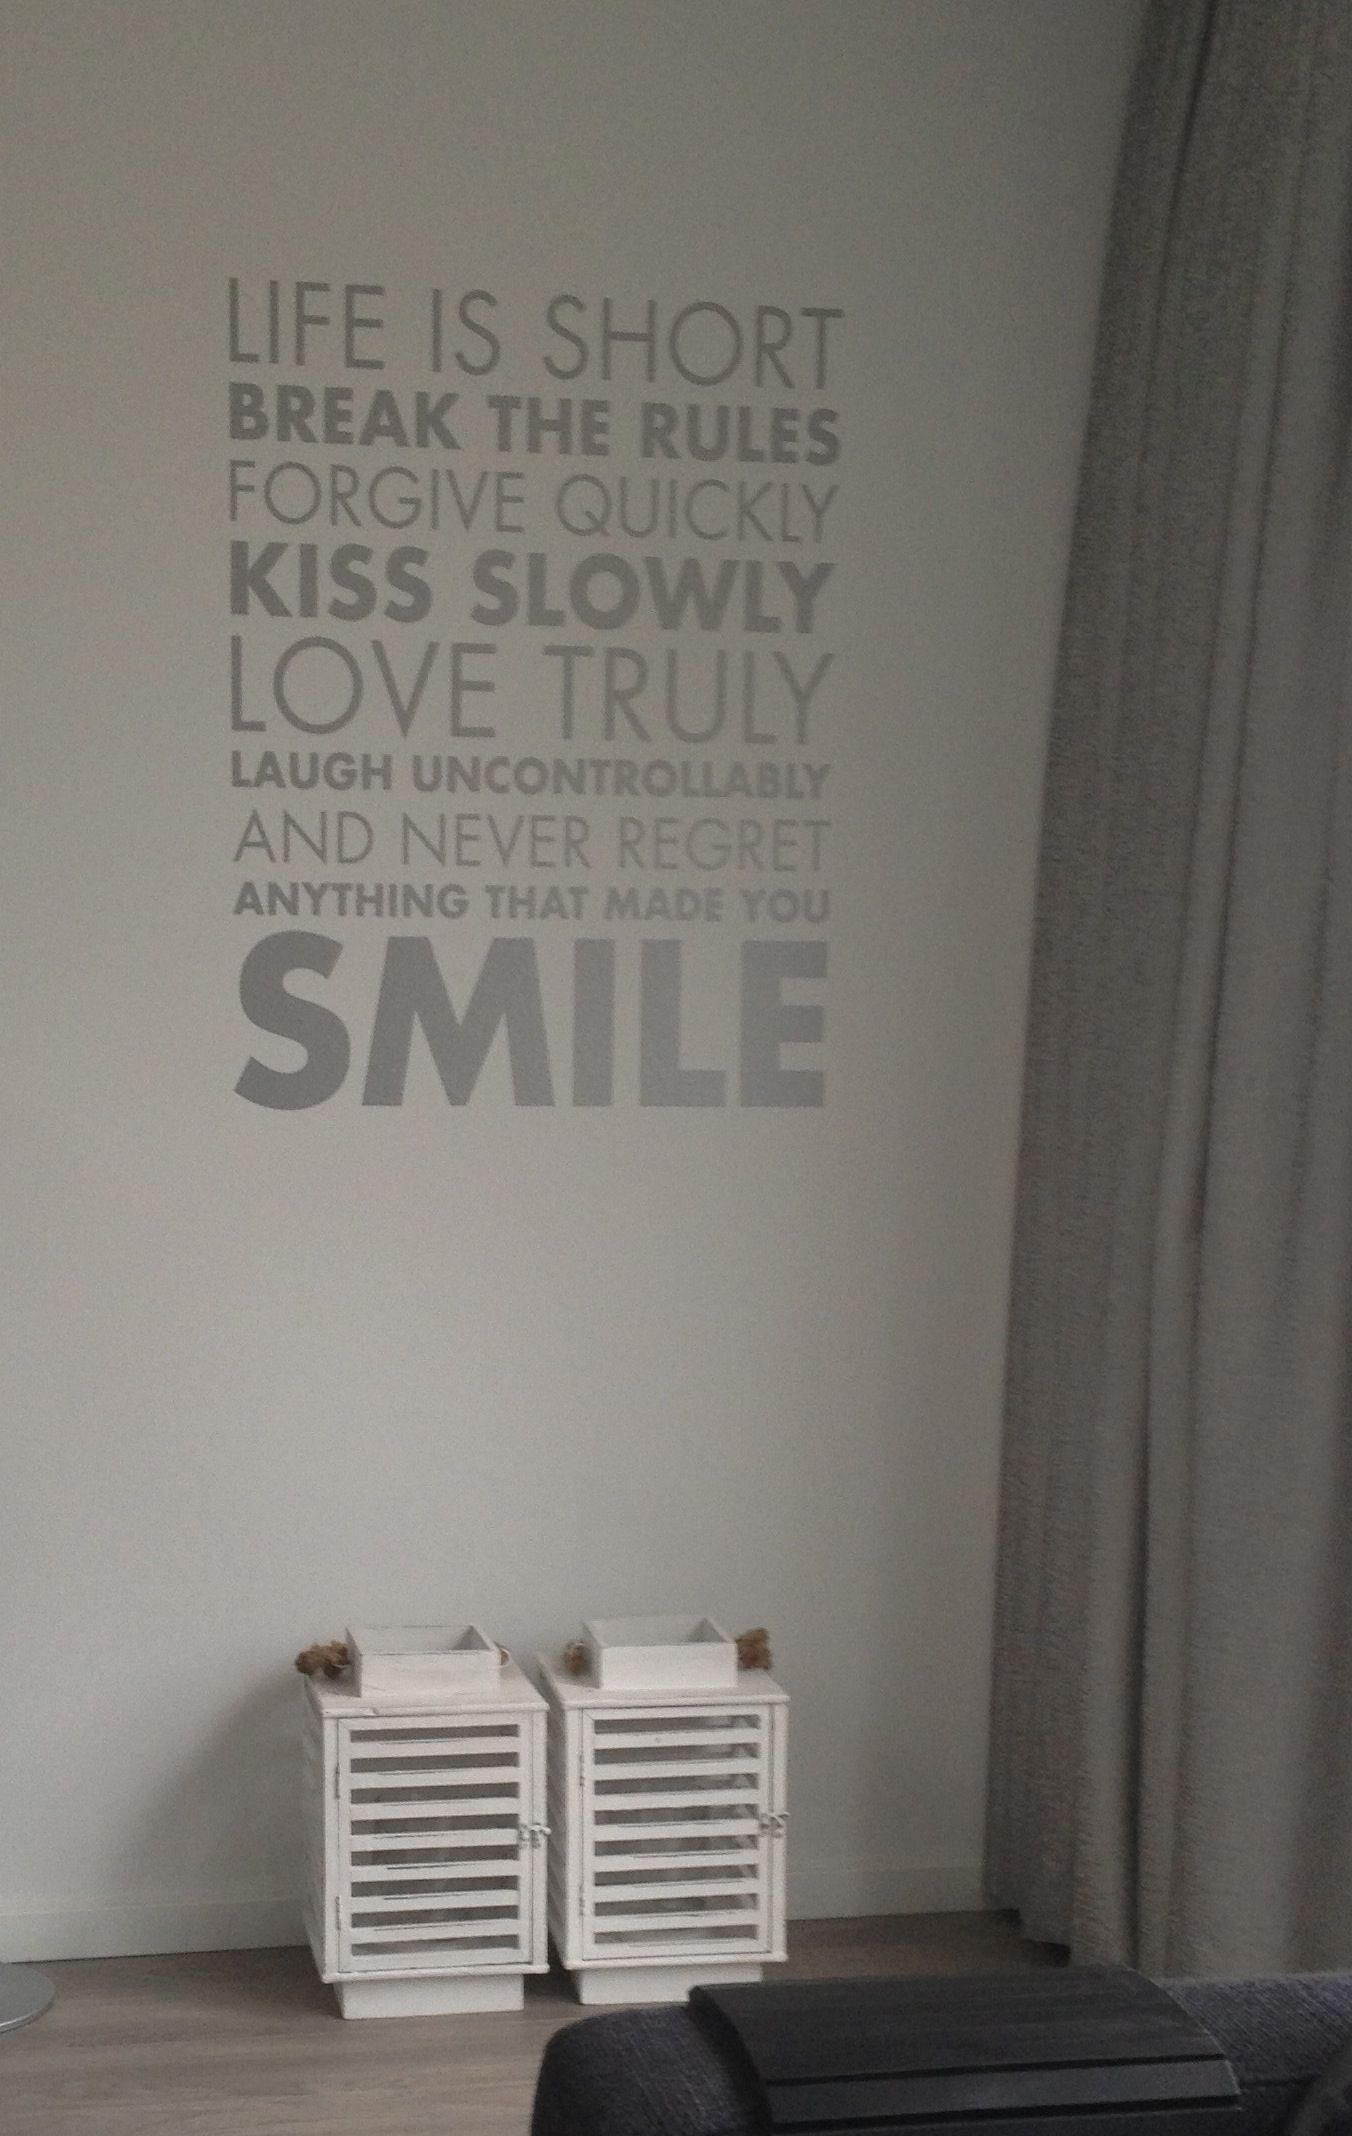 Muursticker woonkamer wall deco livingroom made bij myself my own ideas - Eigentijdse woonkamer deco ...